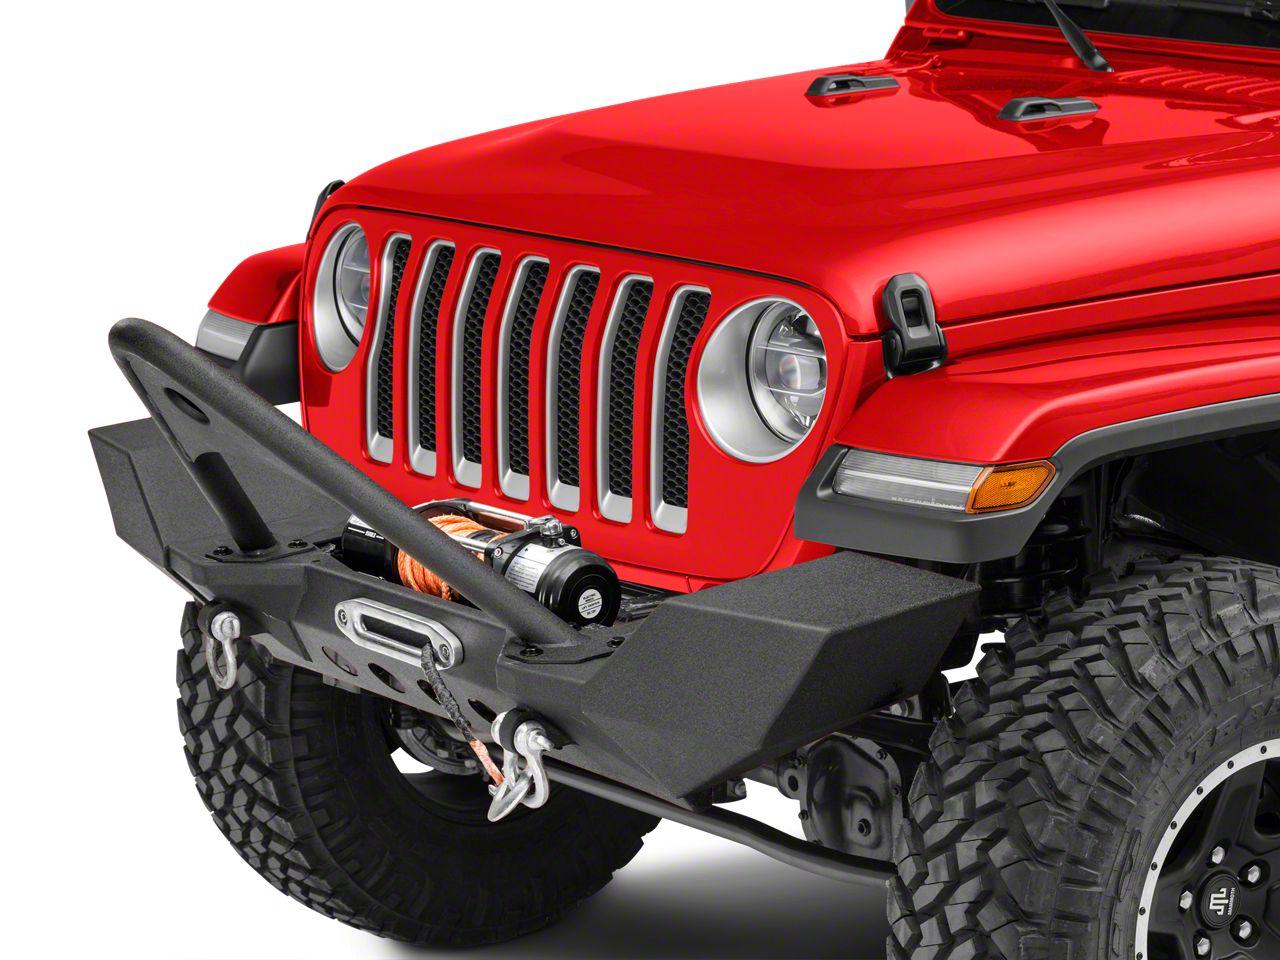 RedRock 4x4 Full Width Front Bumper w/ Stinger Bar - Winch Mount (2018 Jeep Wrangler JL)